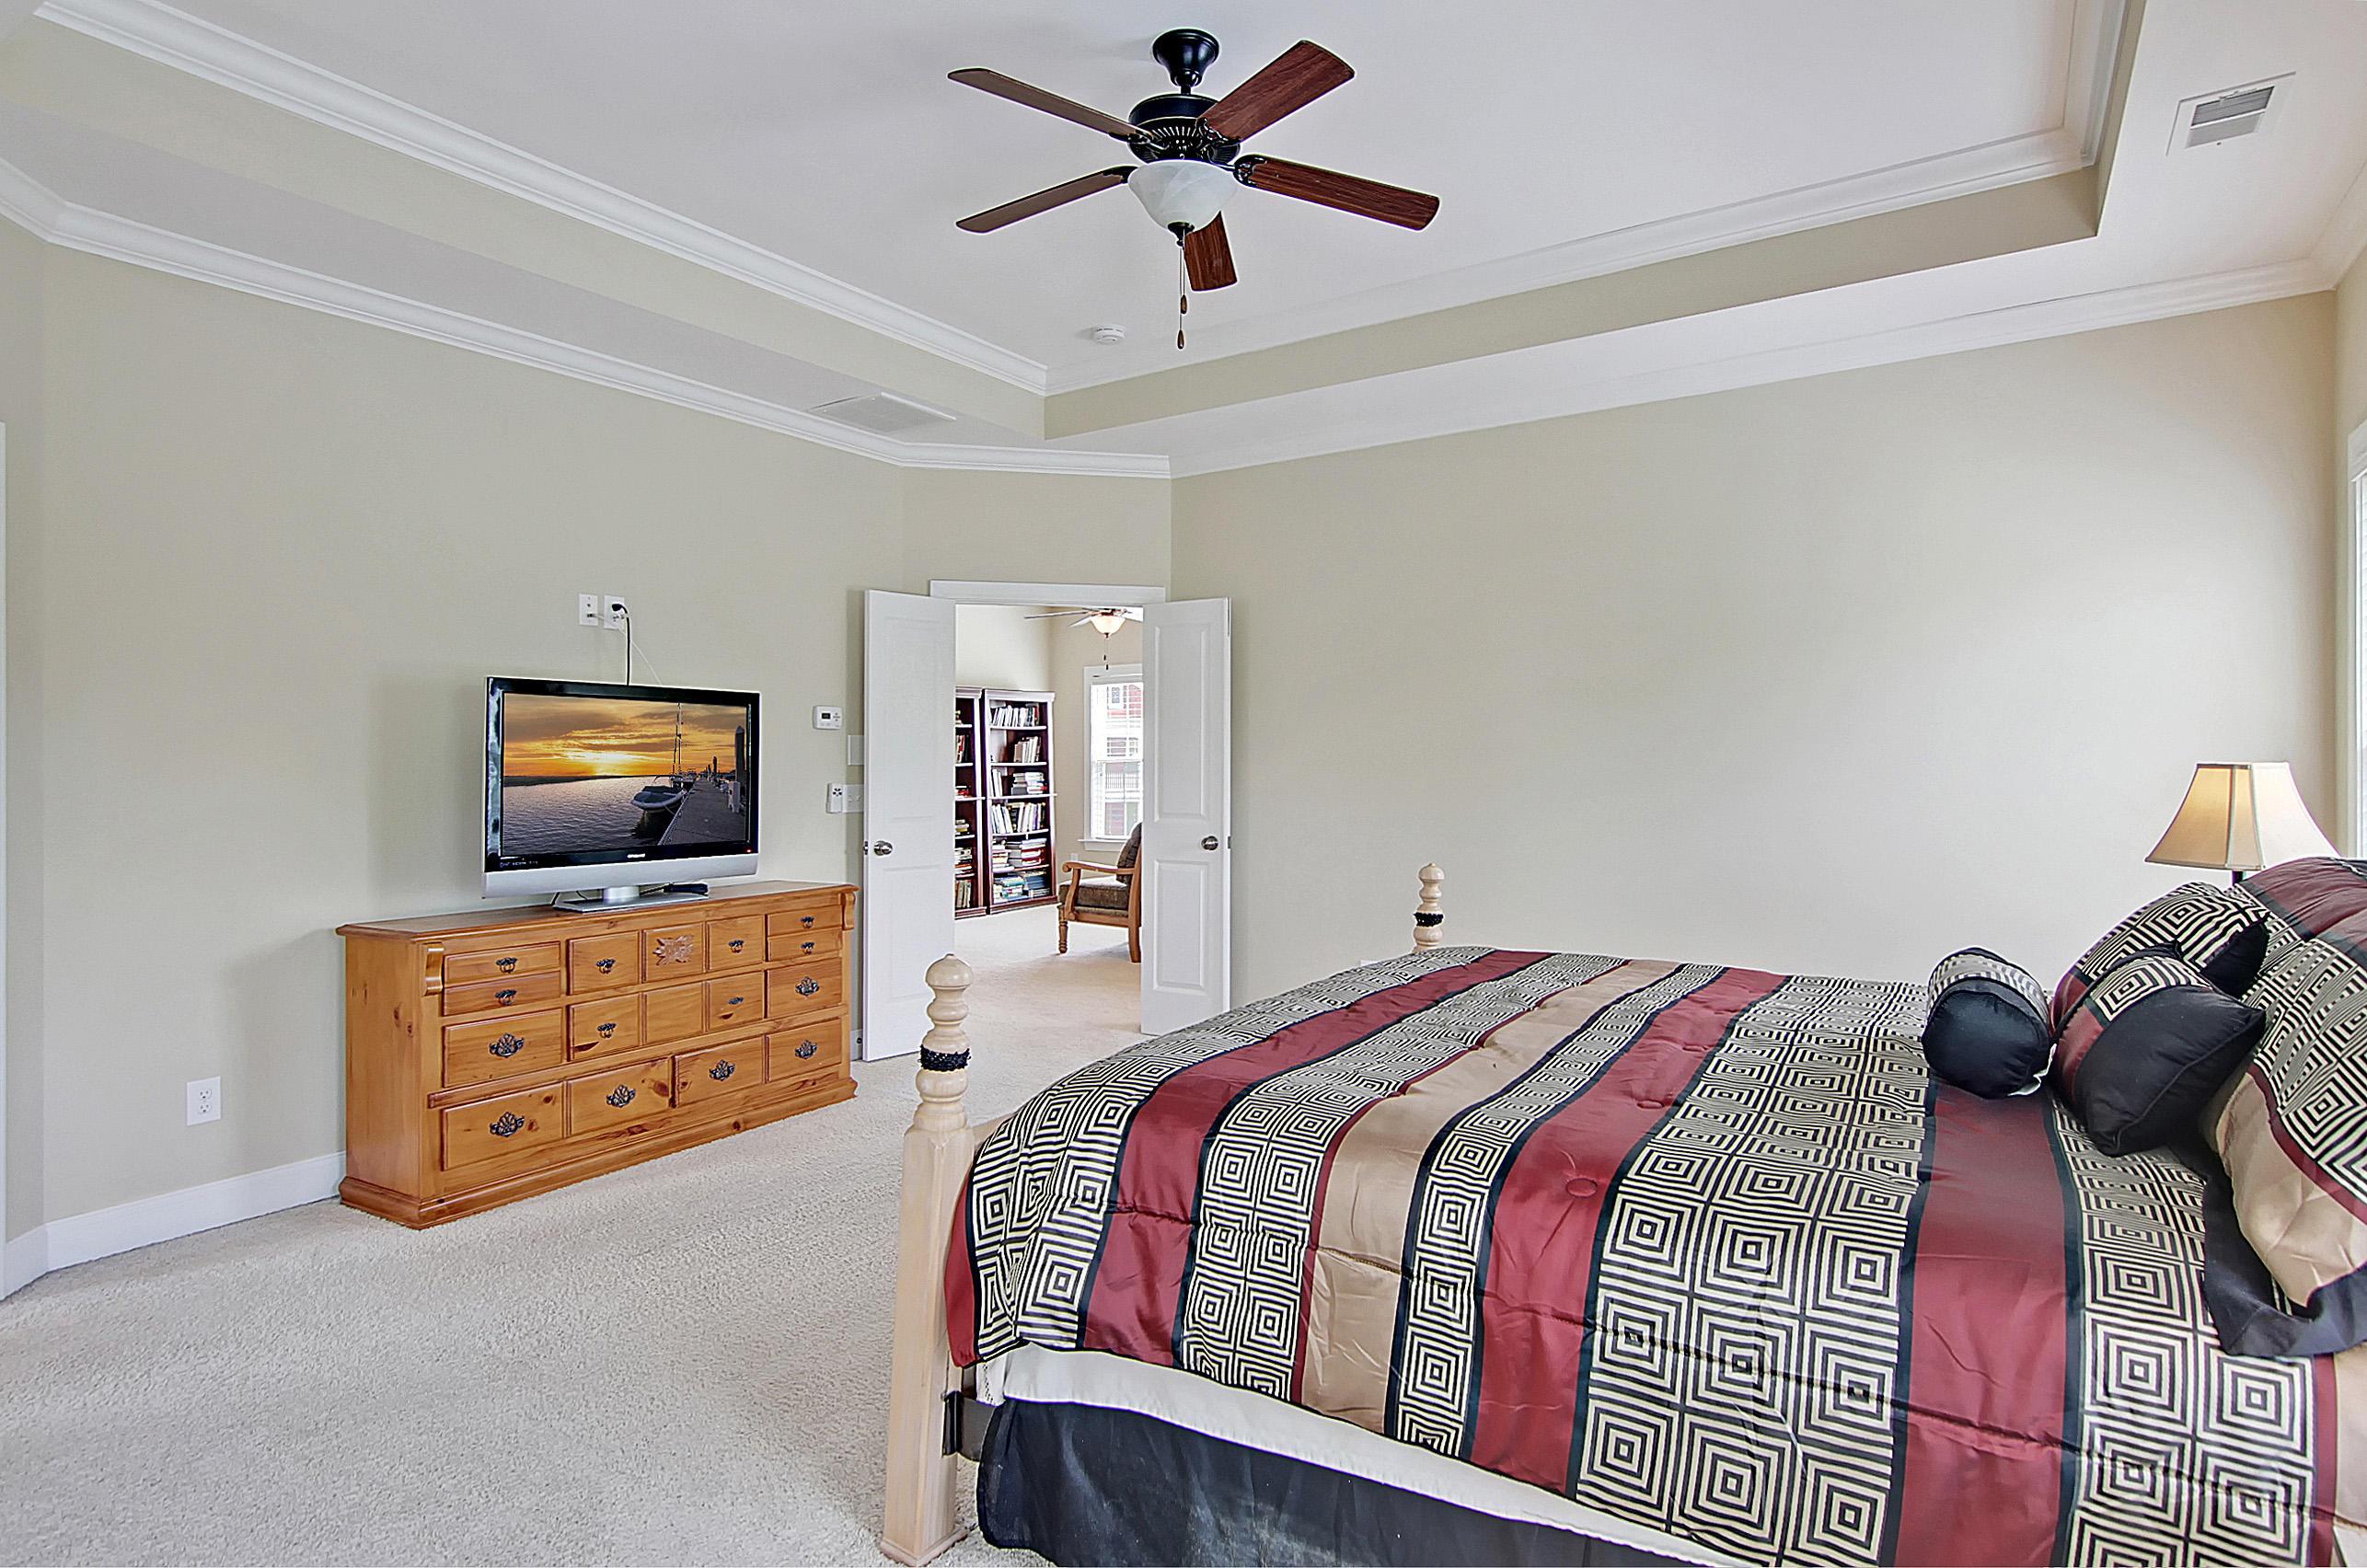 Dunes West Homes For Sale - 1332 Whisker Pole, Mount Pleasant, SC - 39